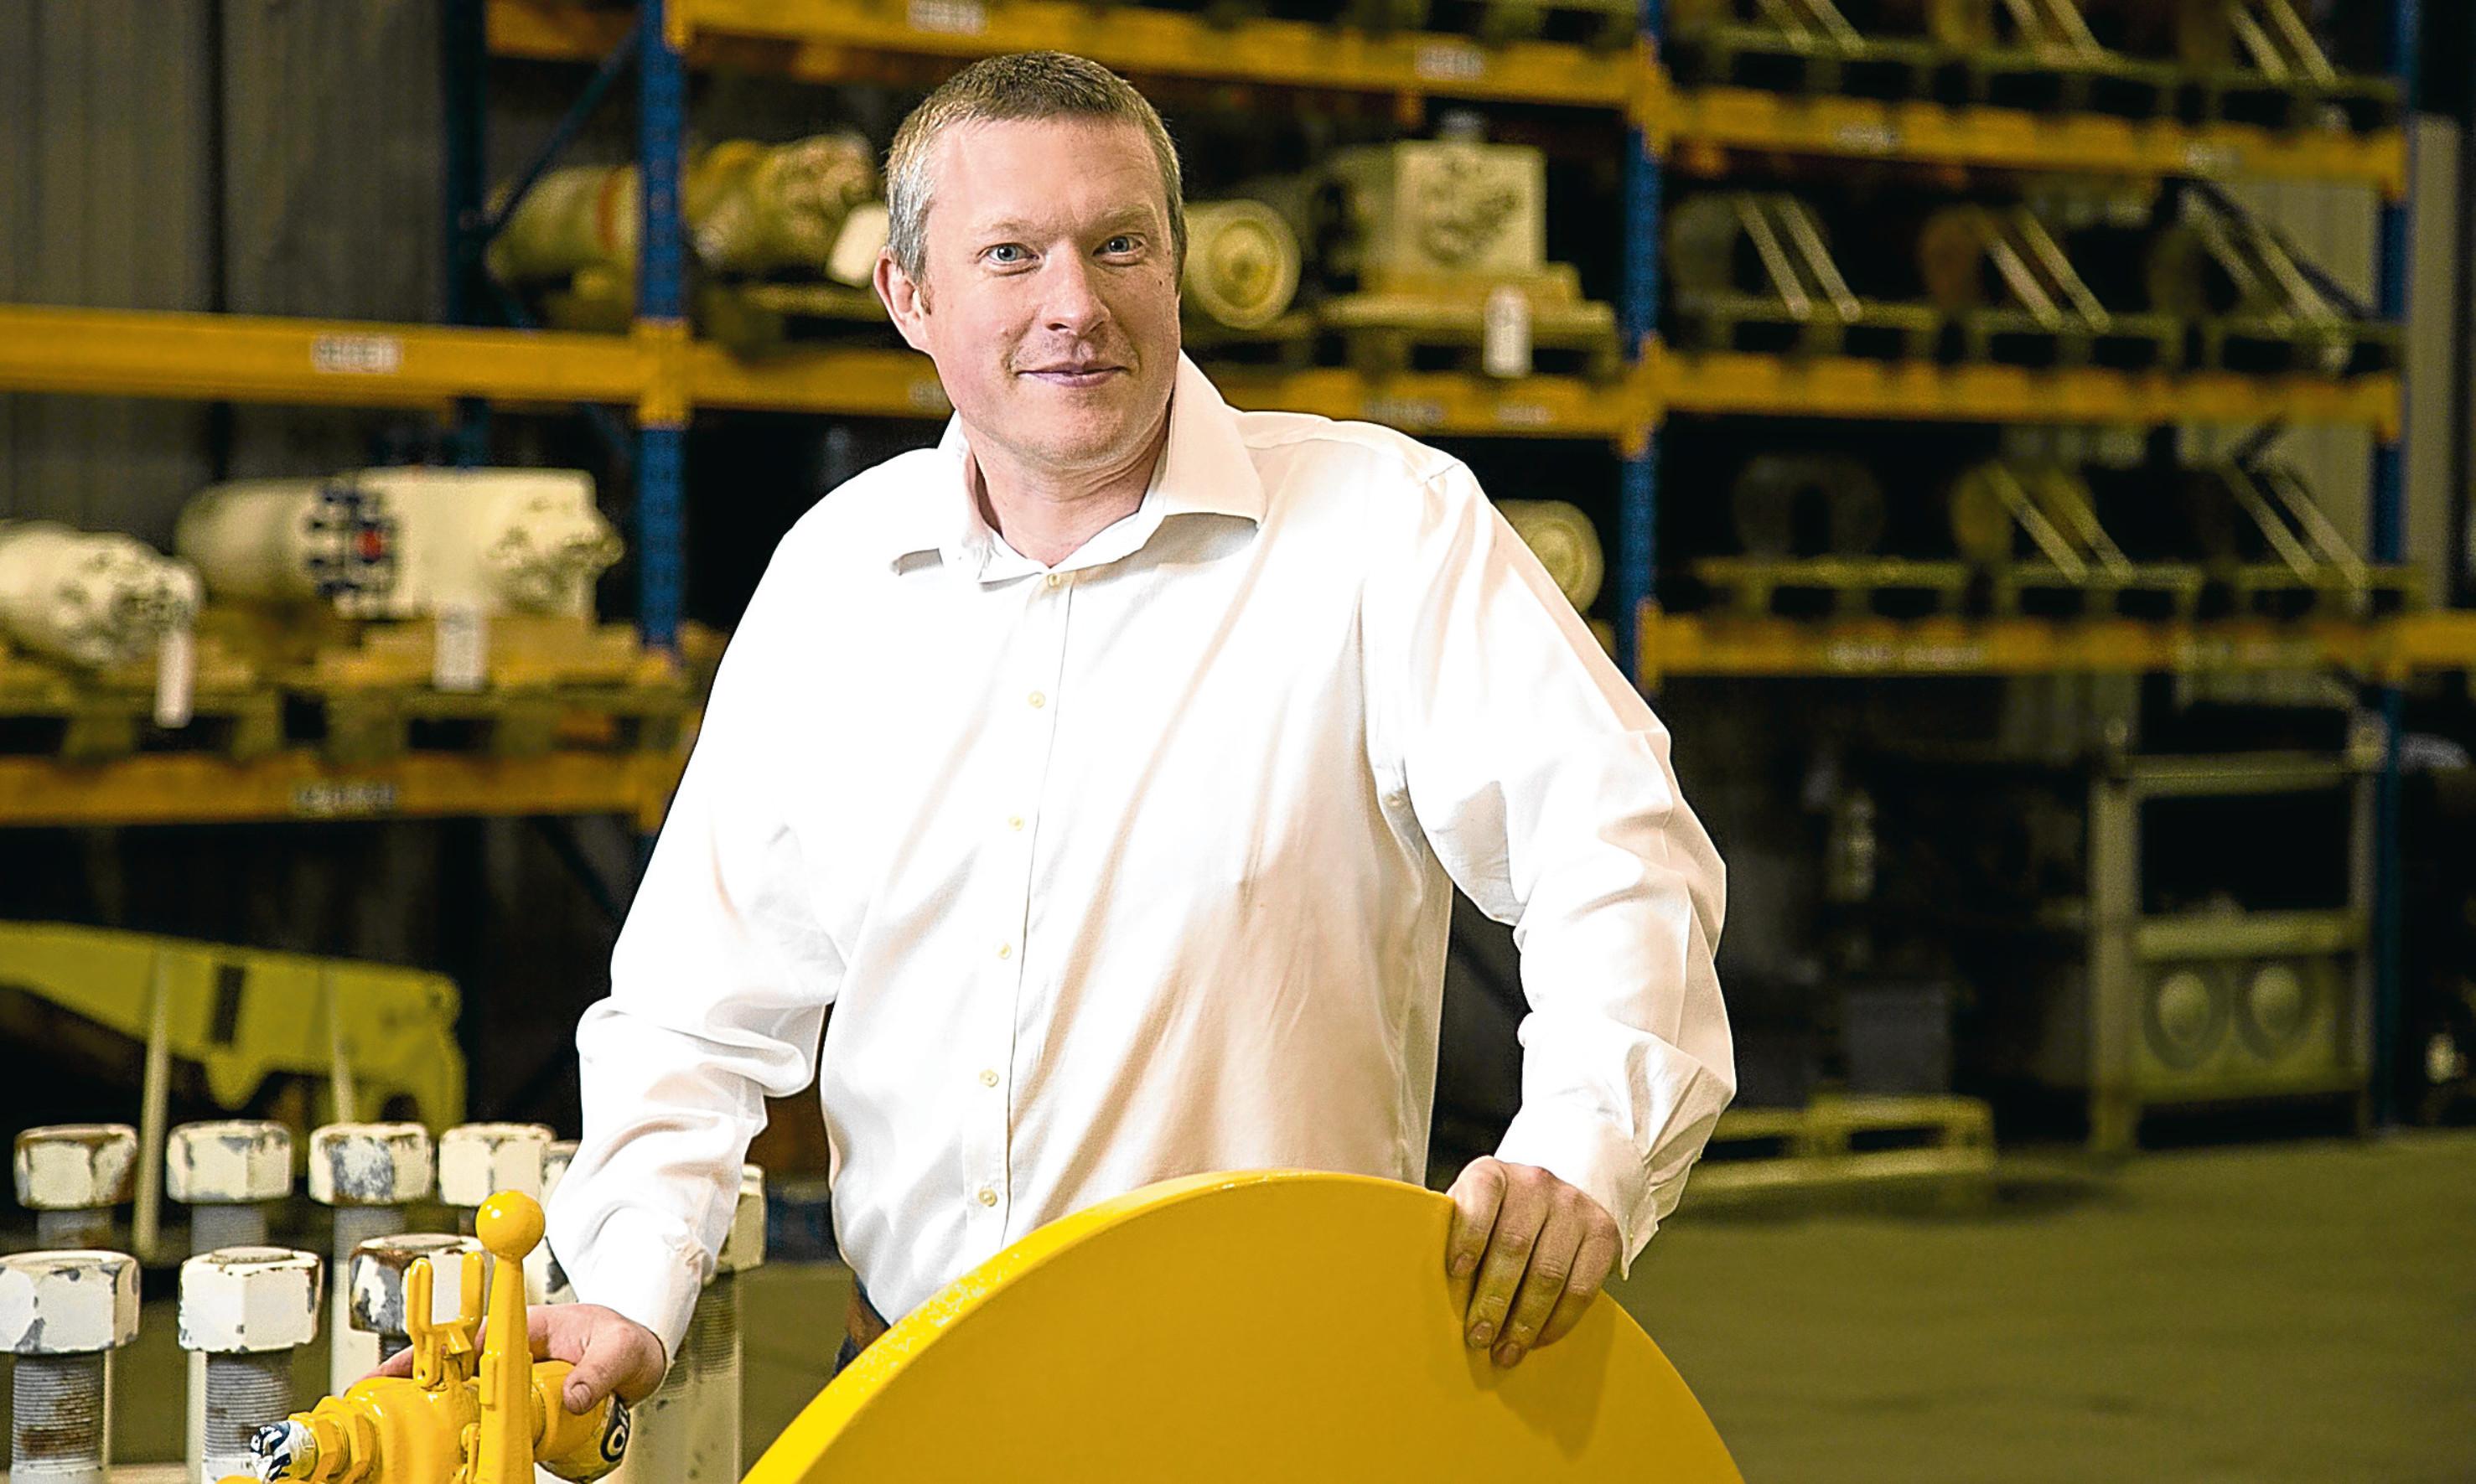 Alex Fyfe, managing director at OilMac